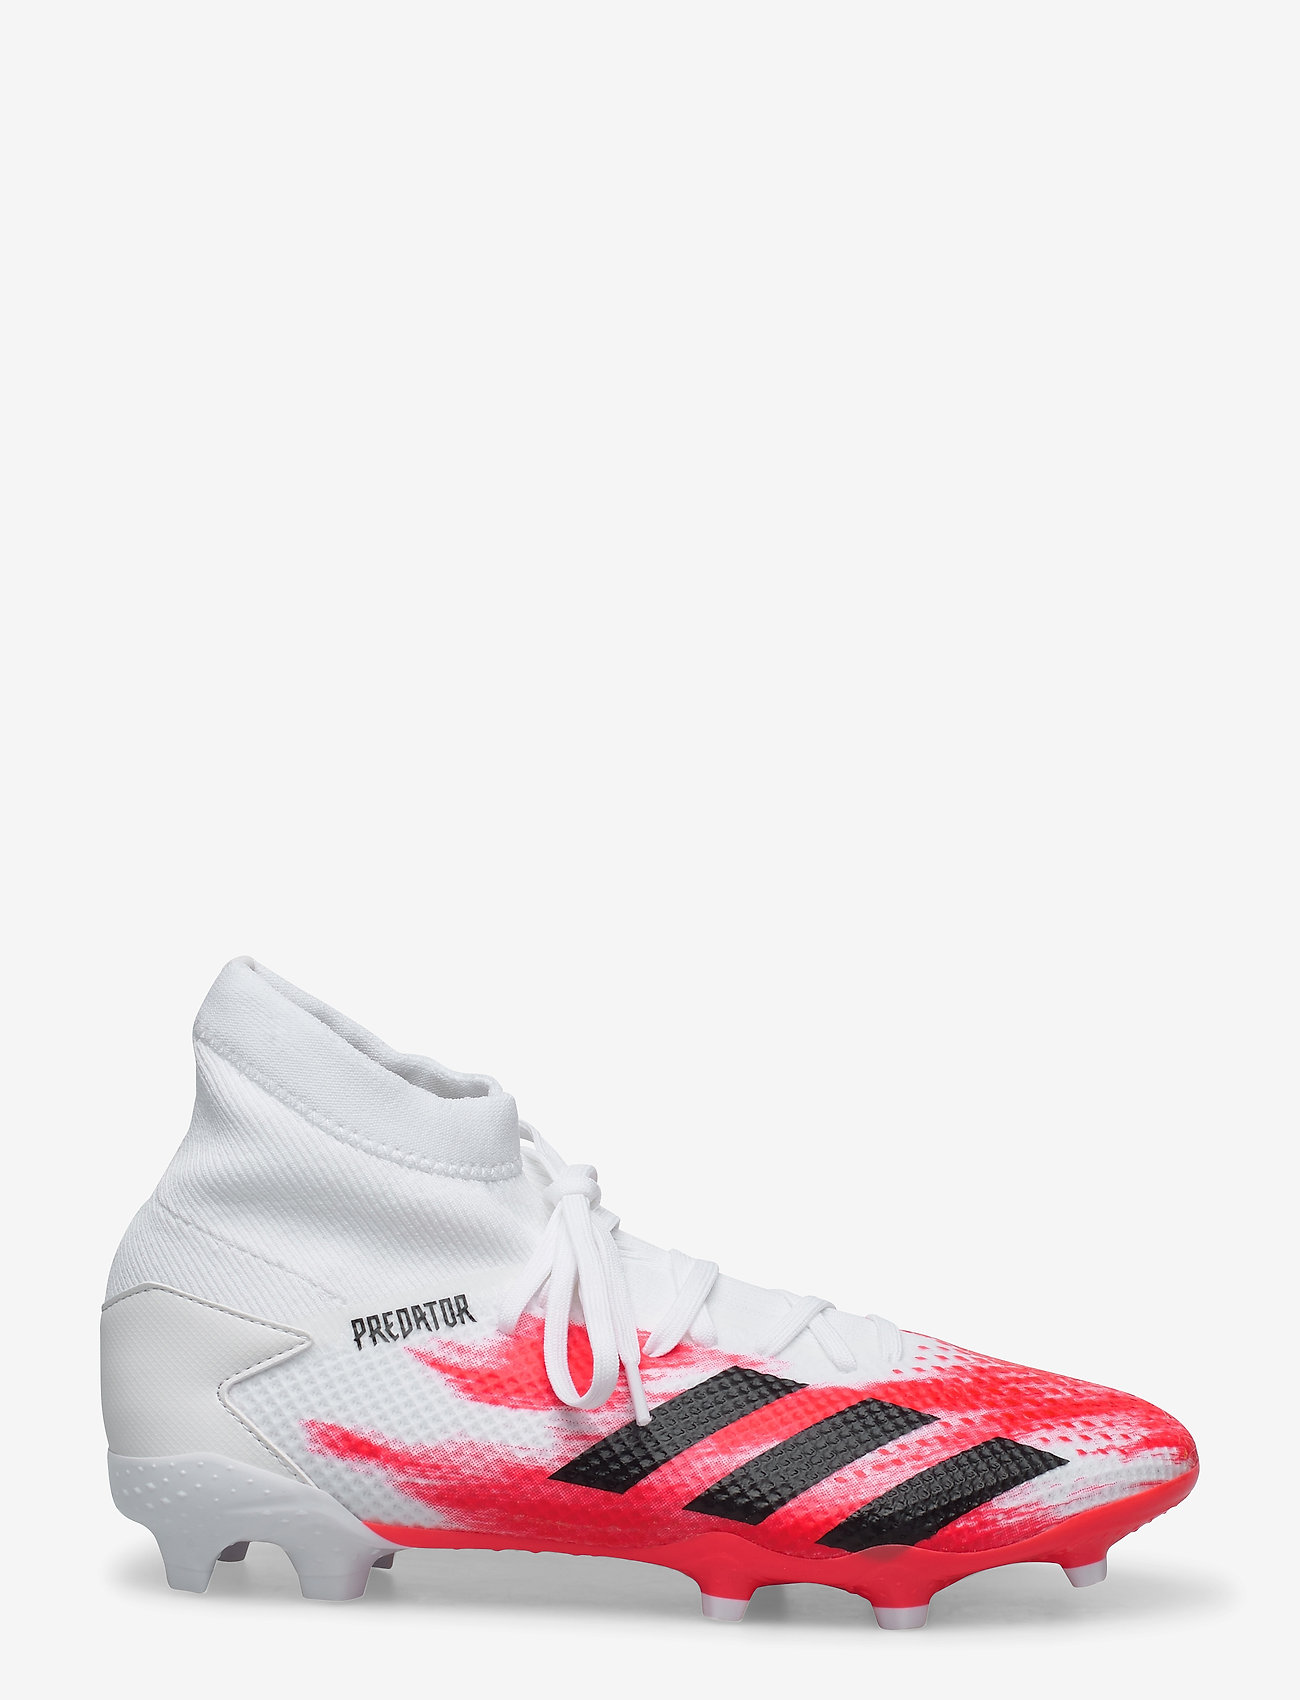 adidas Performance - PREDATOR 20.3 FG - fotbollsskor - ftwwht/cblack/pop - 1